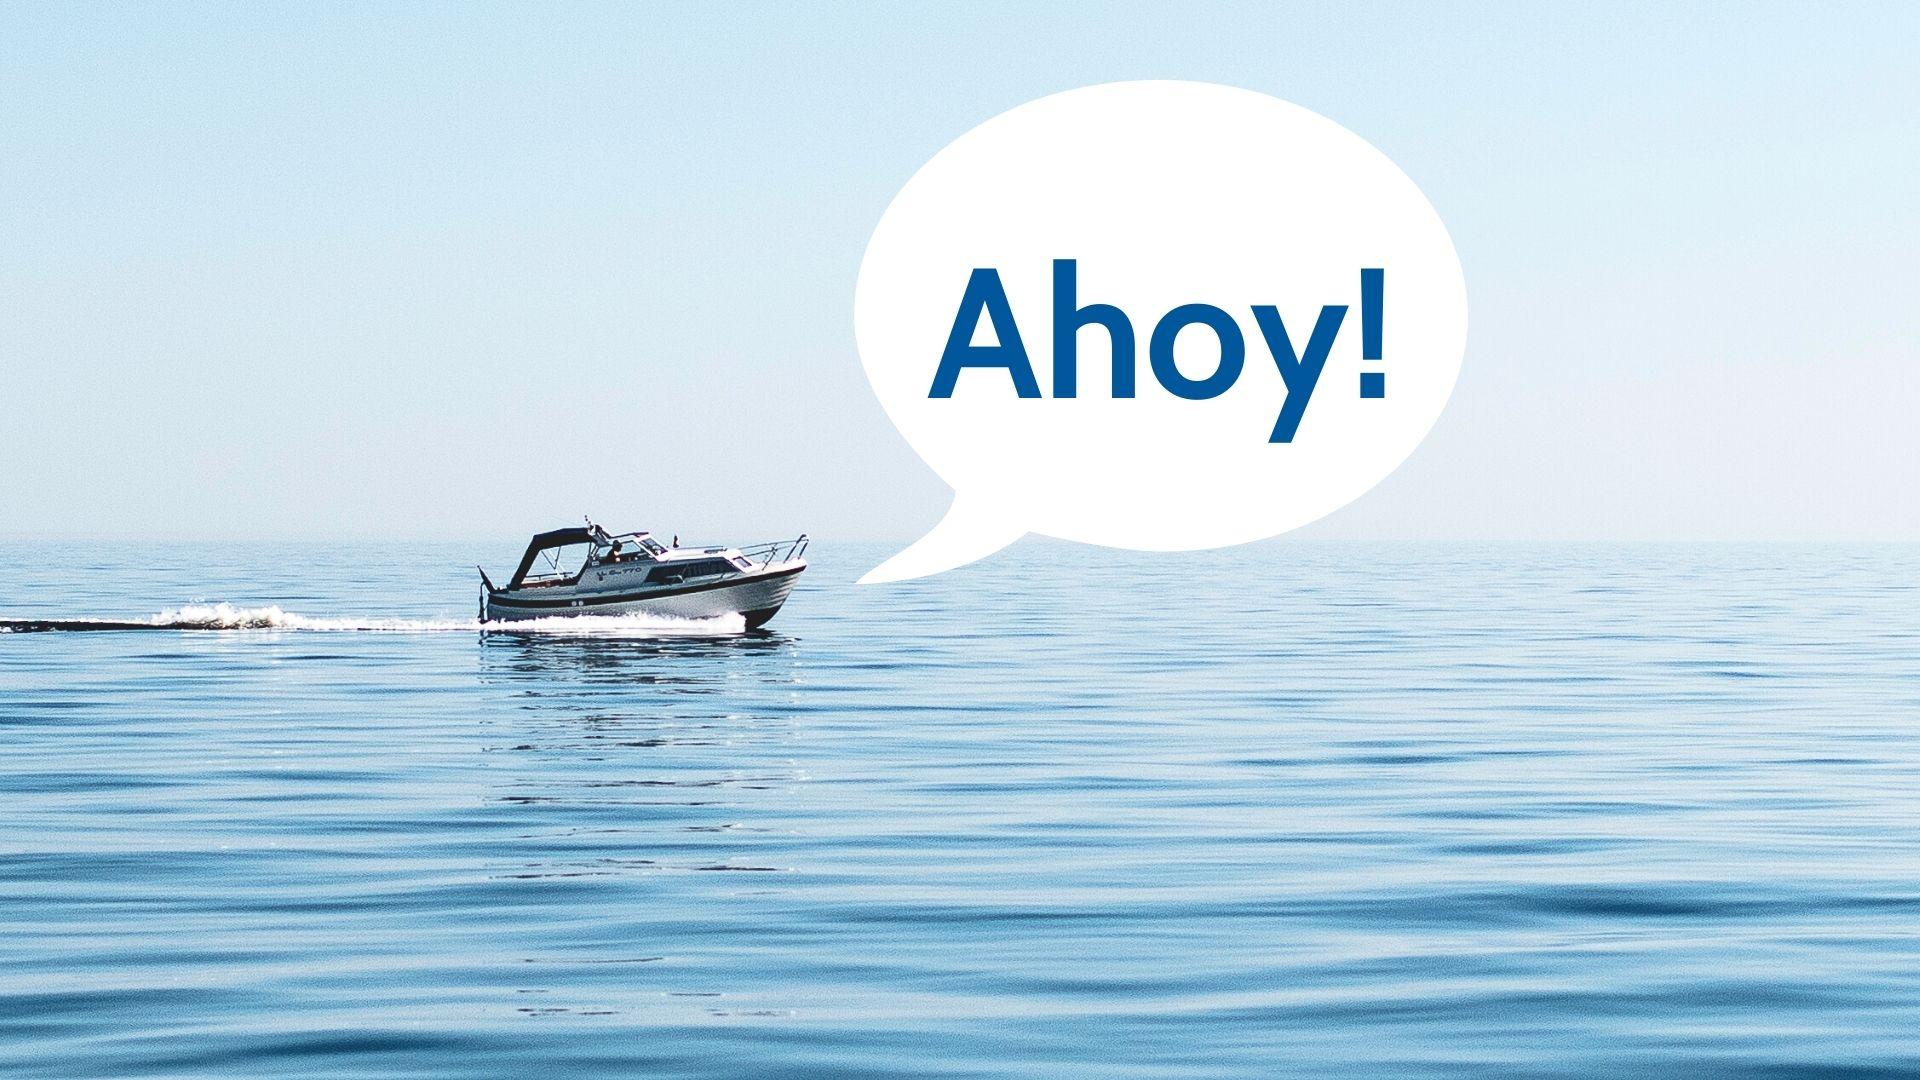 ahoy feature